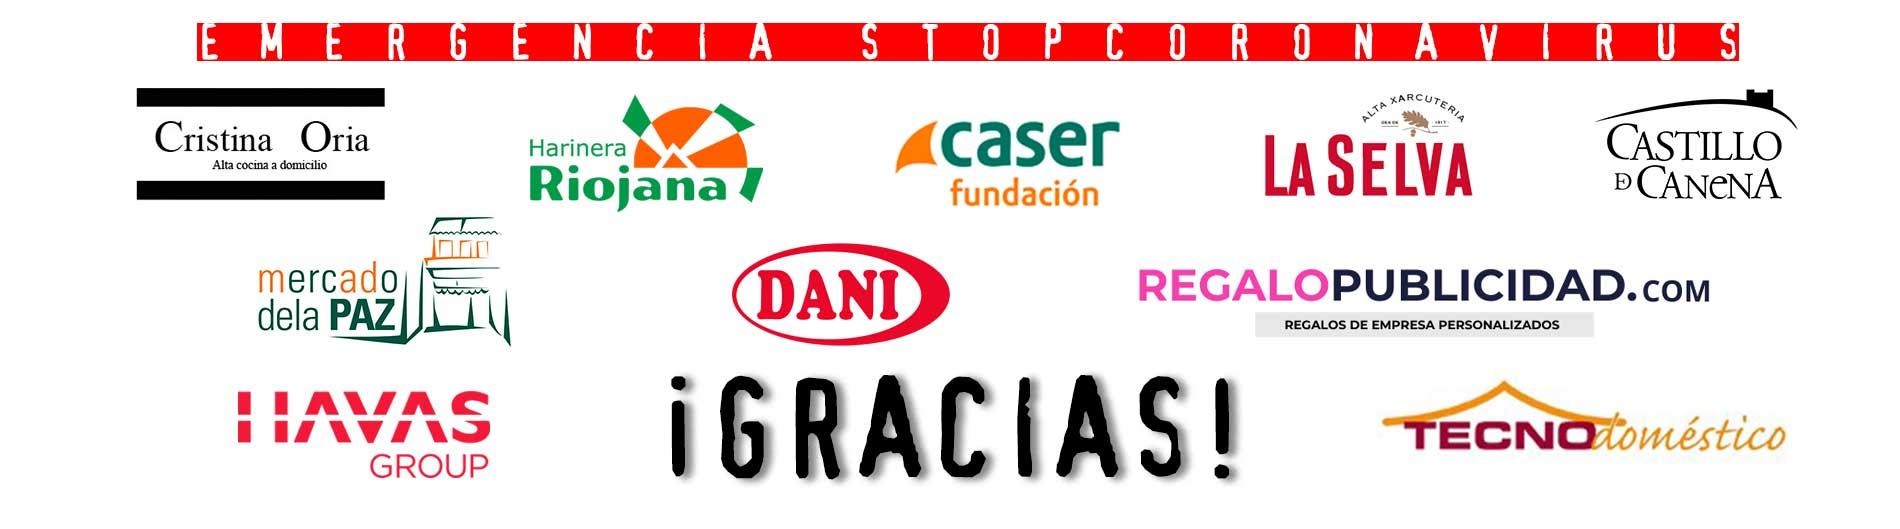 coronavirus; emergencia; salud; CESAL; dona; empresas